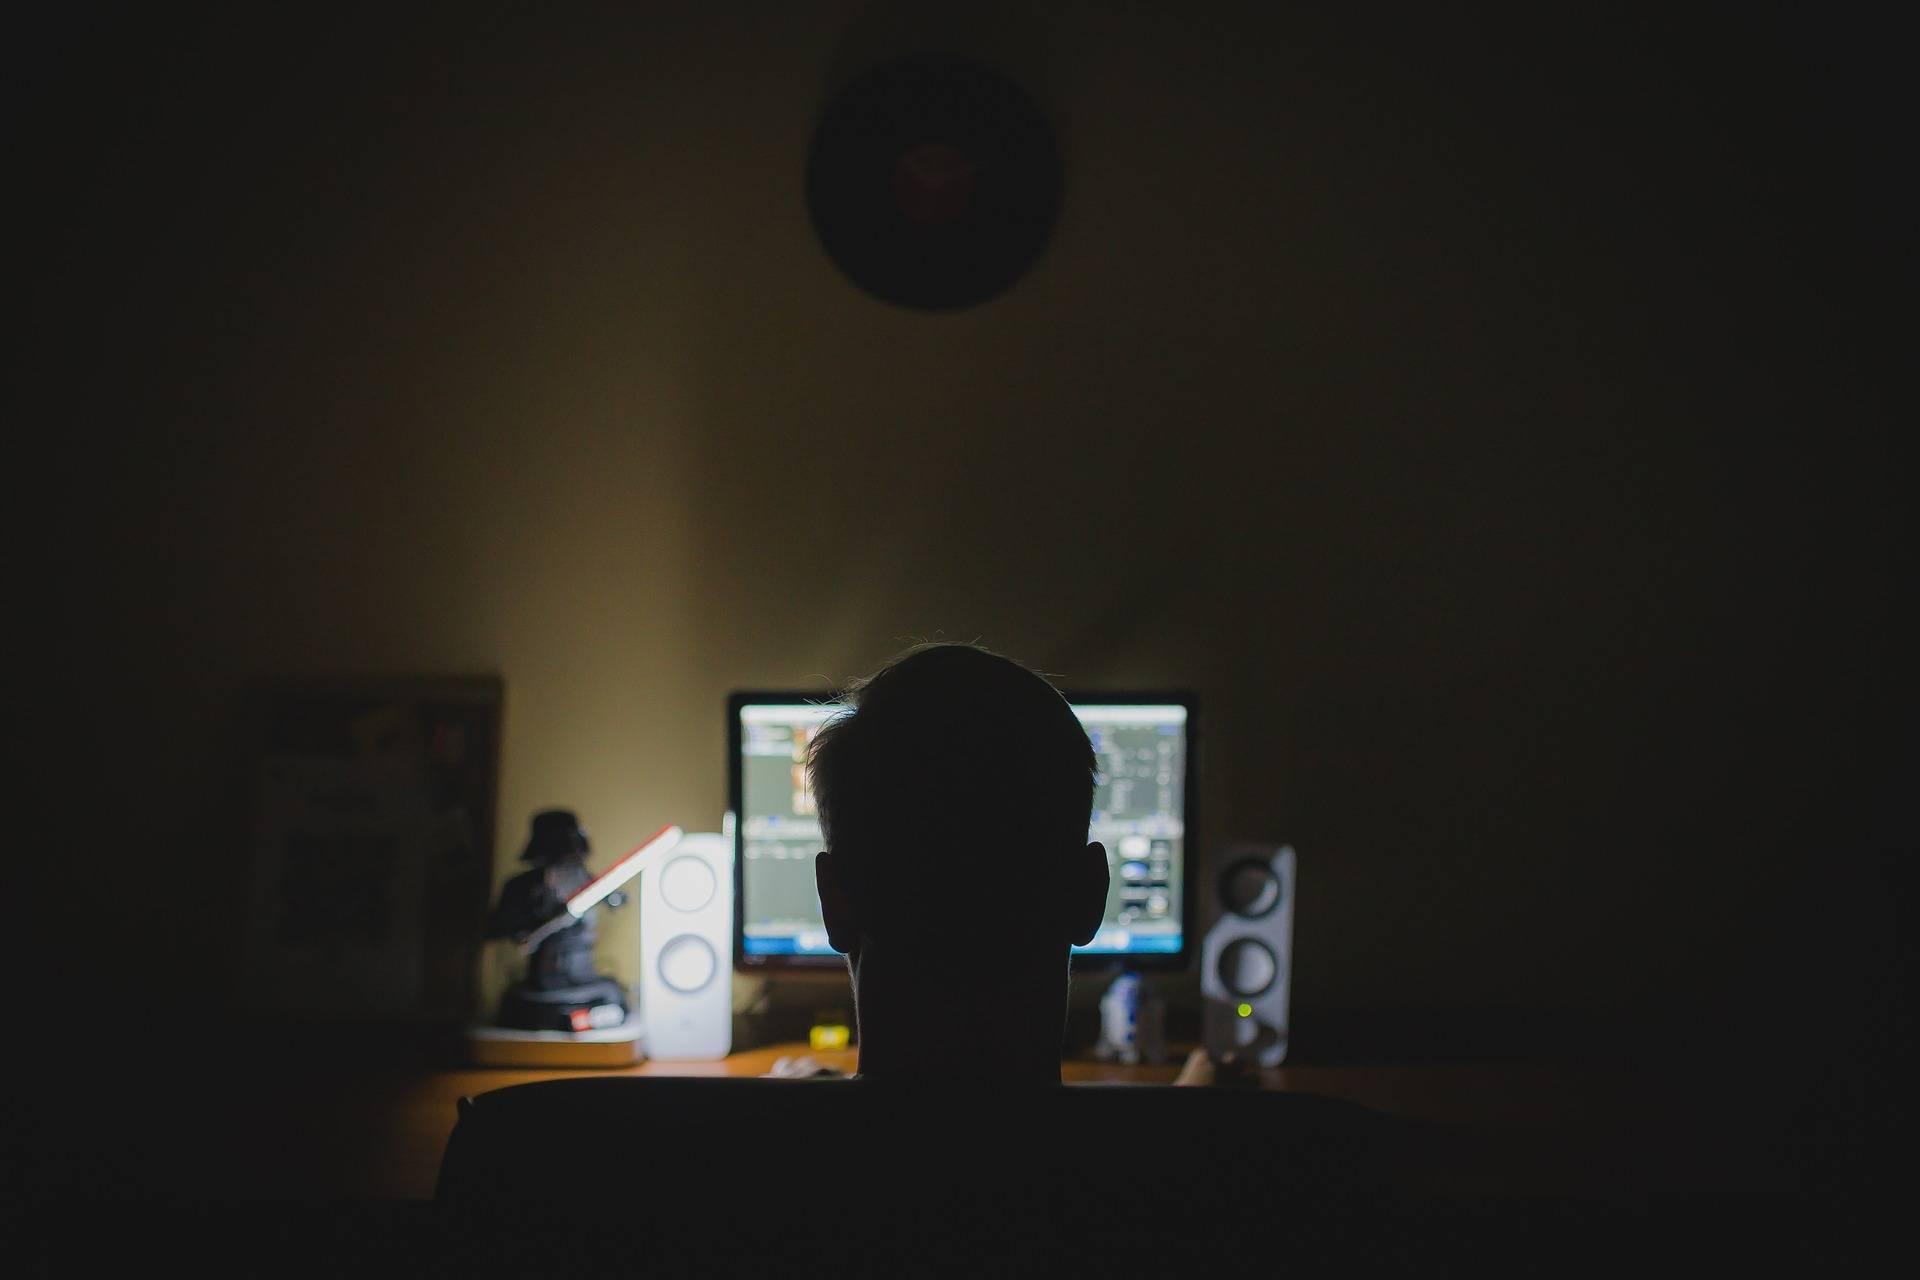 Les cyberattaques visent les banques, les réseaux sociaux, les sites de rencontres. (Pixabay / Tookapic)